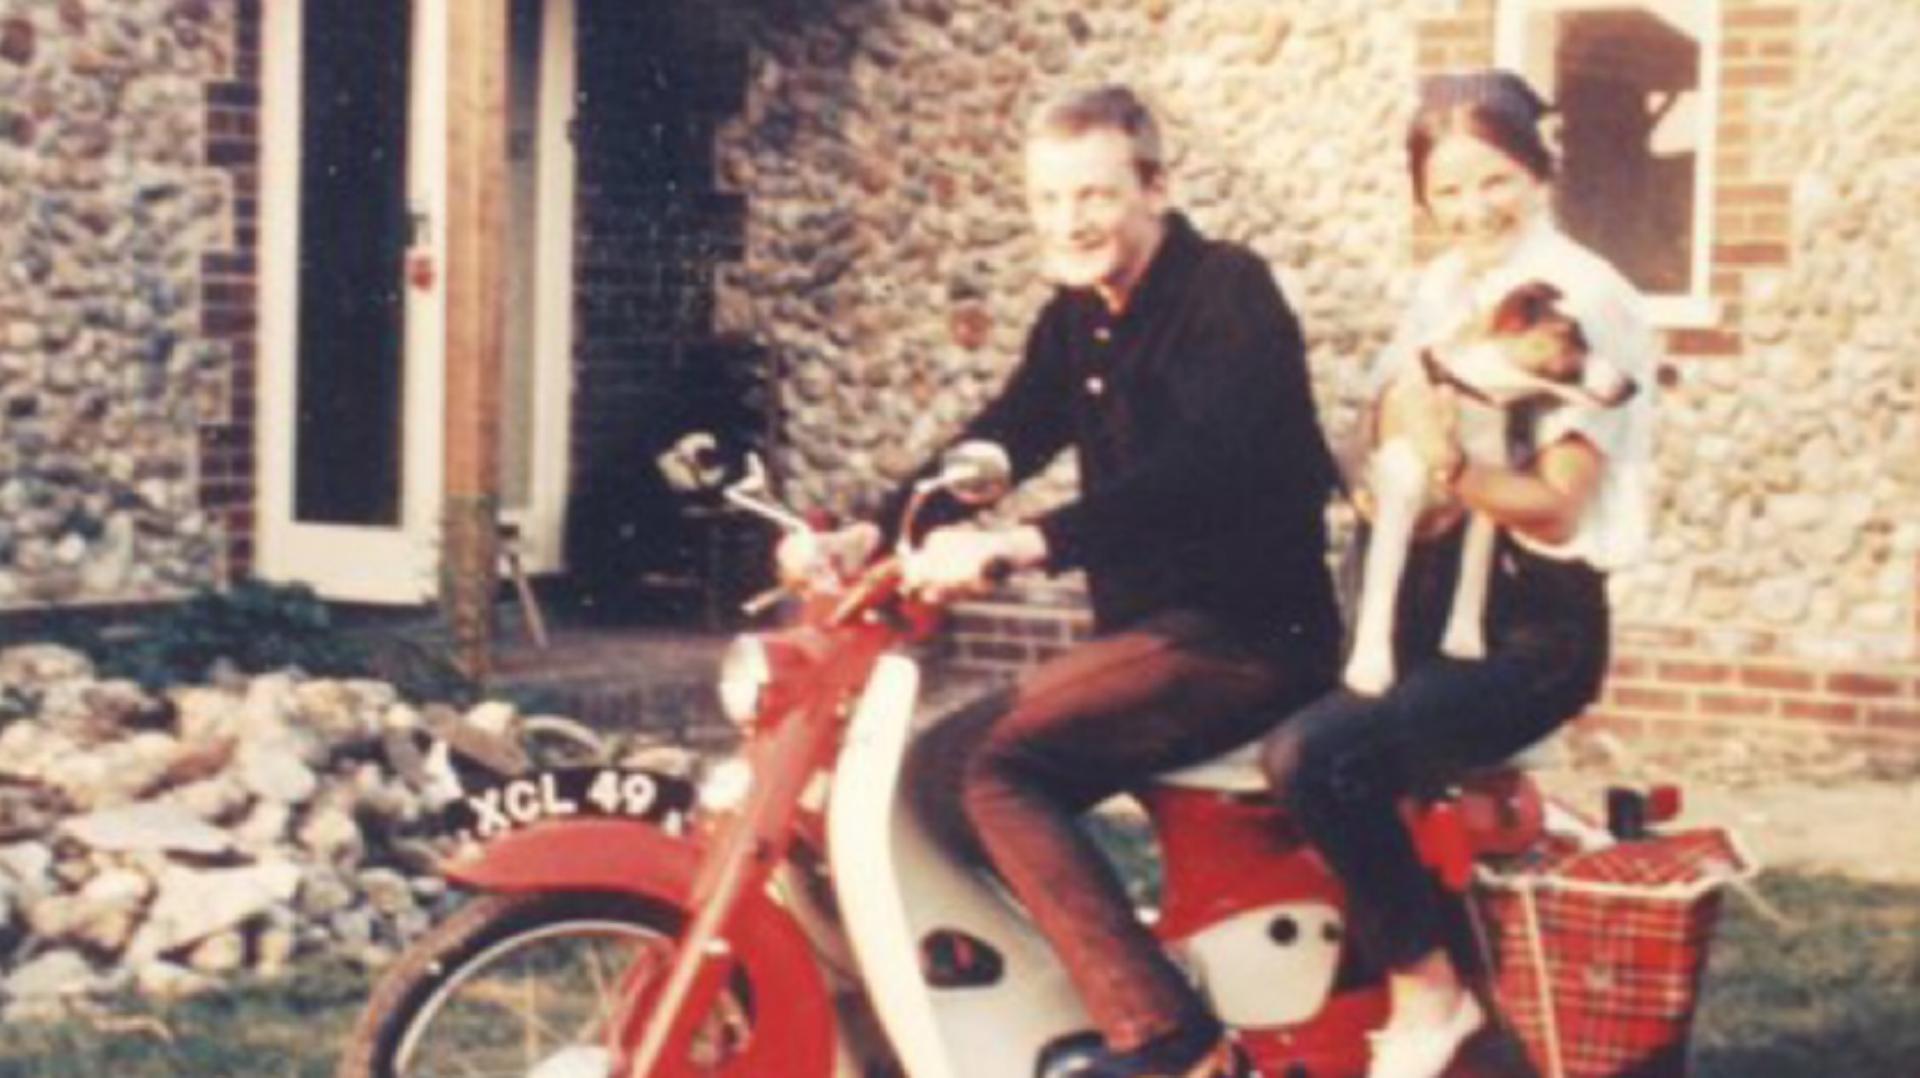 James Dyson and sister Shanie Dyson, sitting on a Honda 50